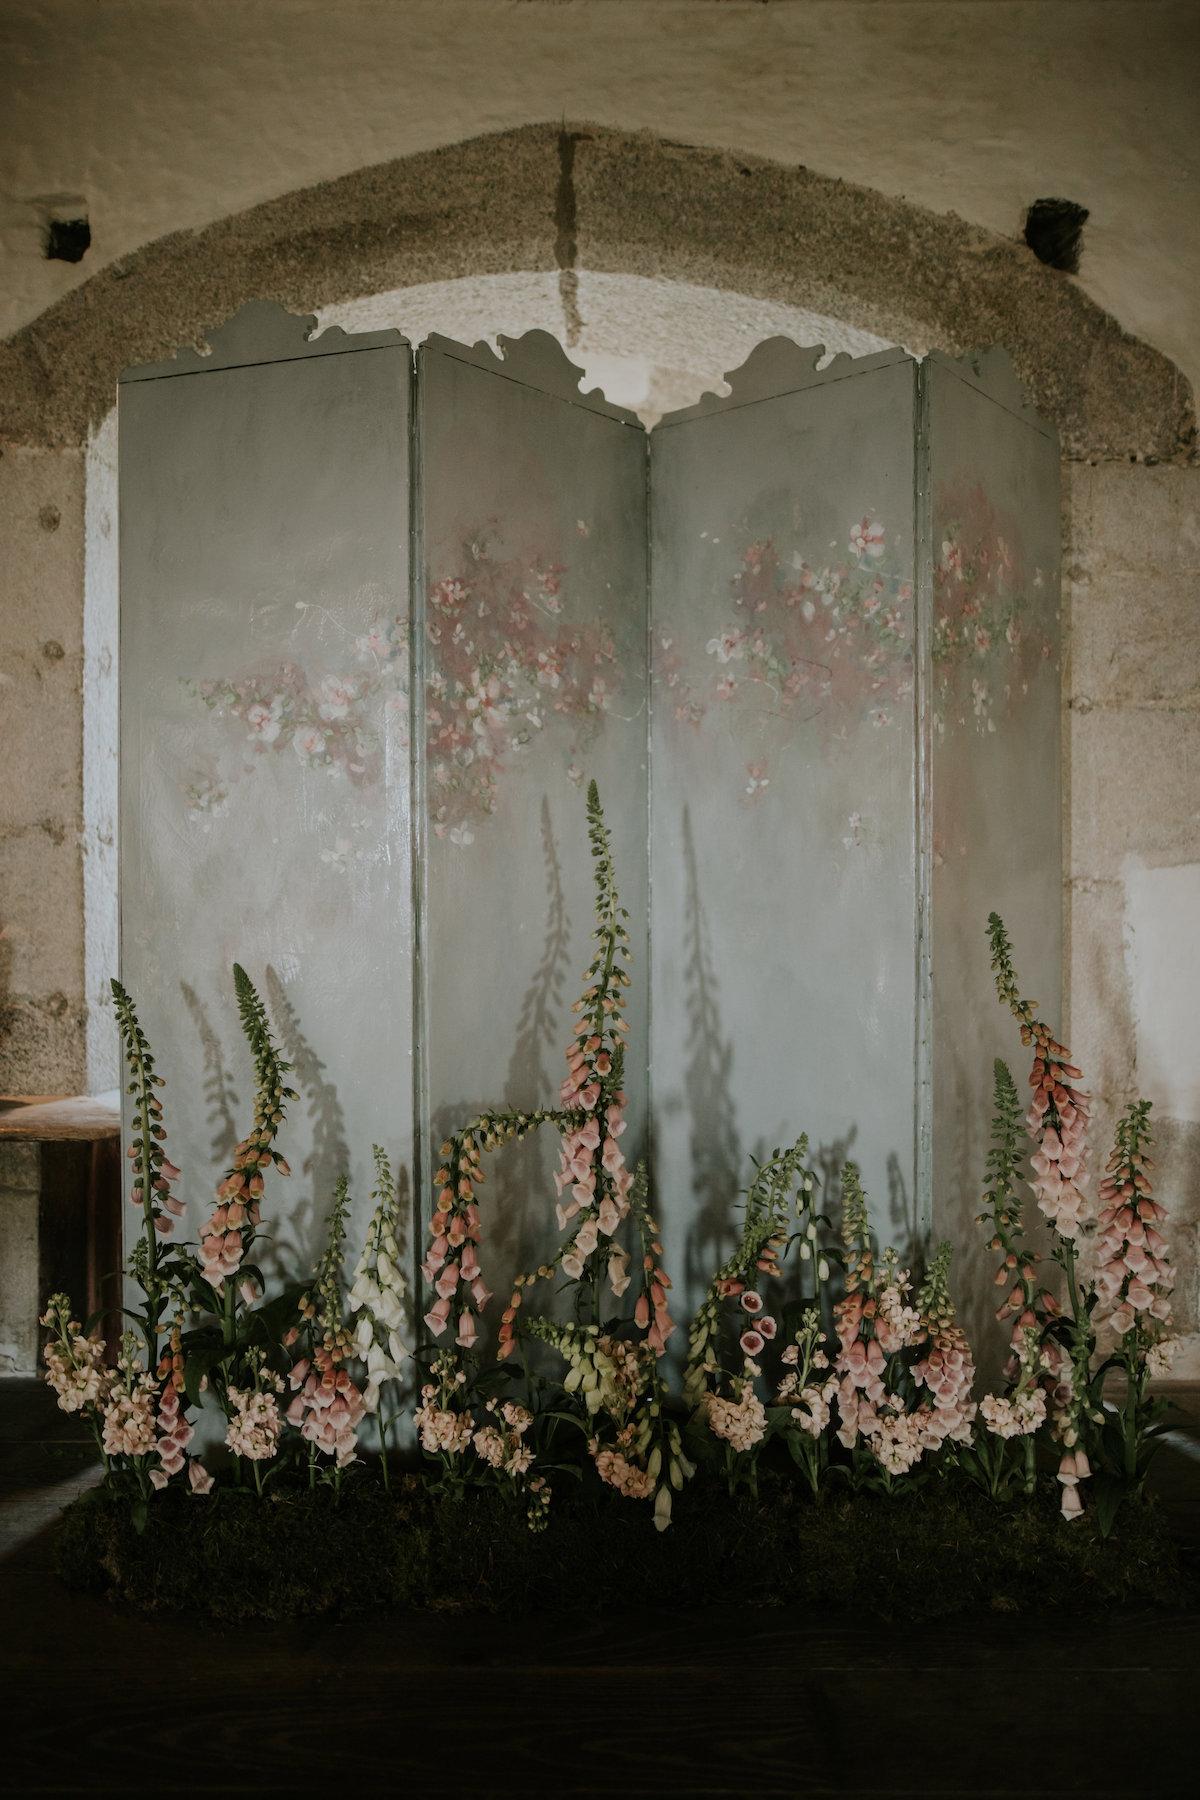 Loulabel Floral Design loulabel-floral-design-wedding-ceremony-backdrop-foxgloves.jpg